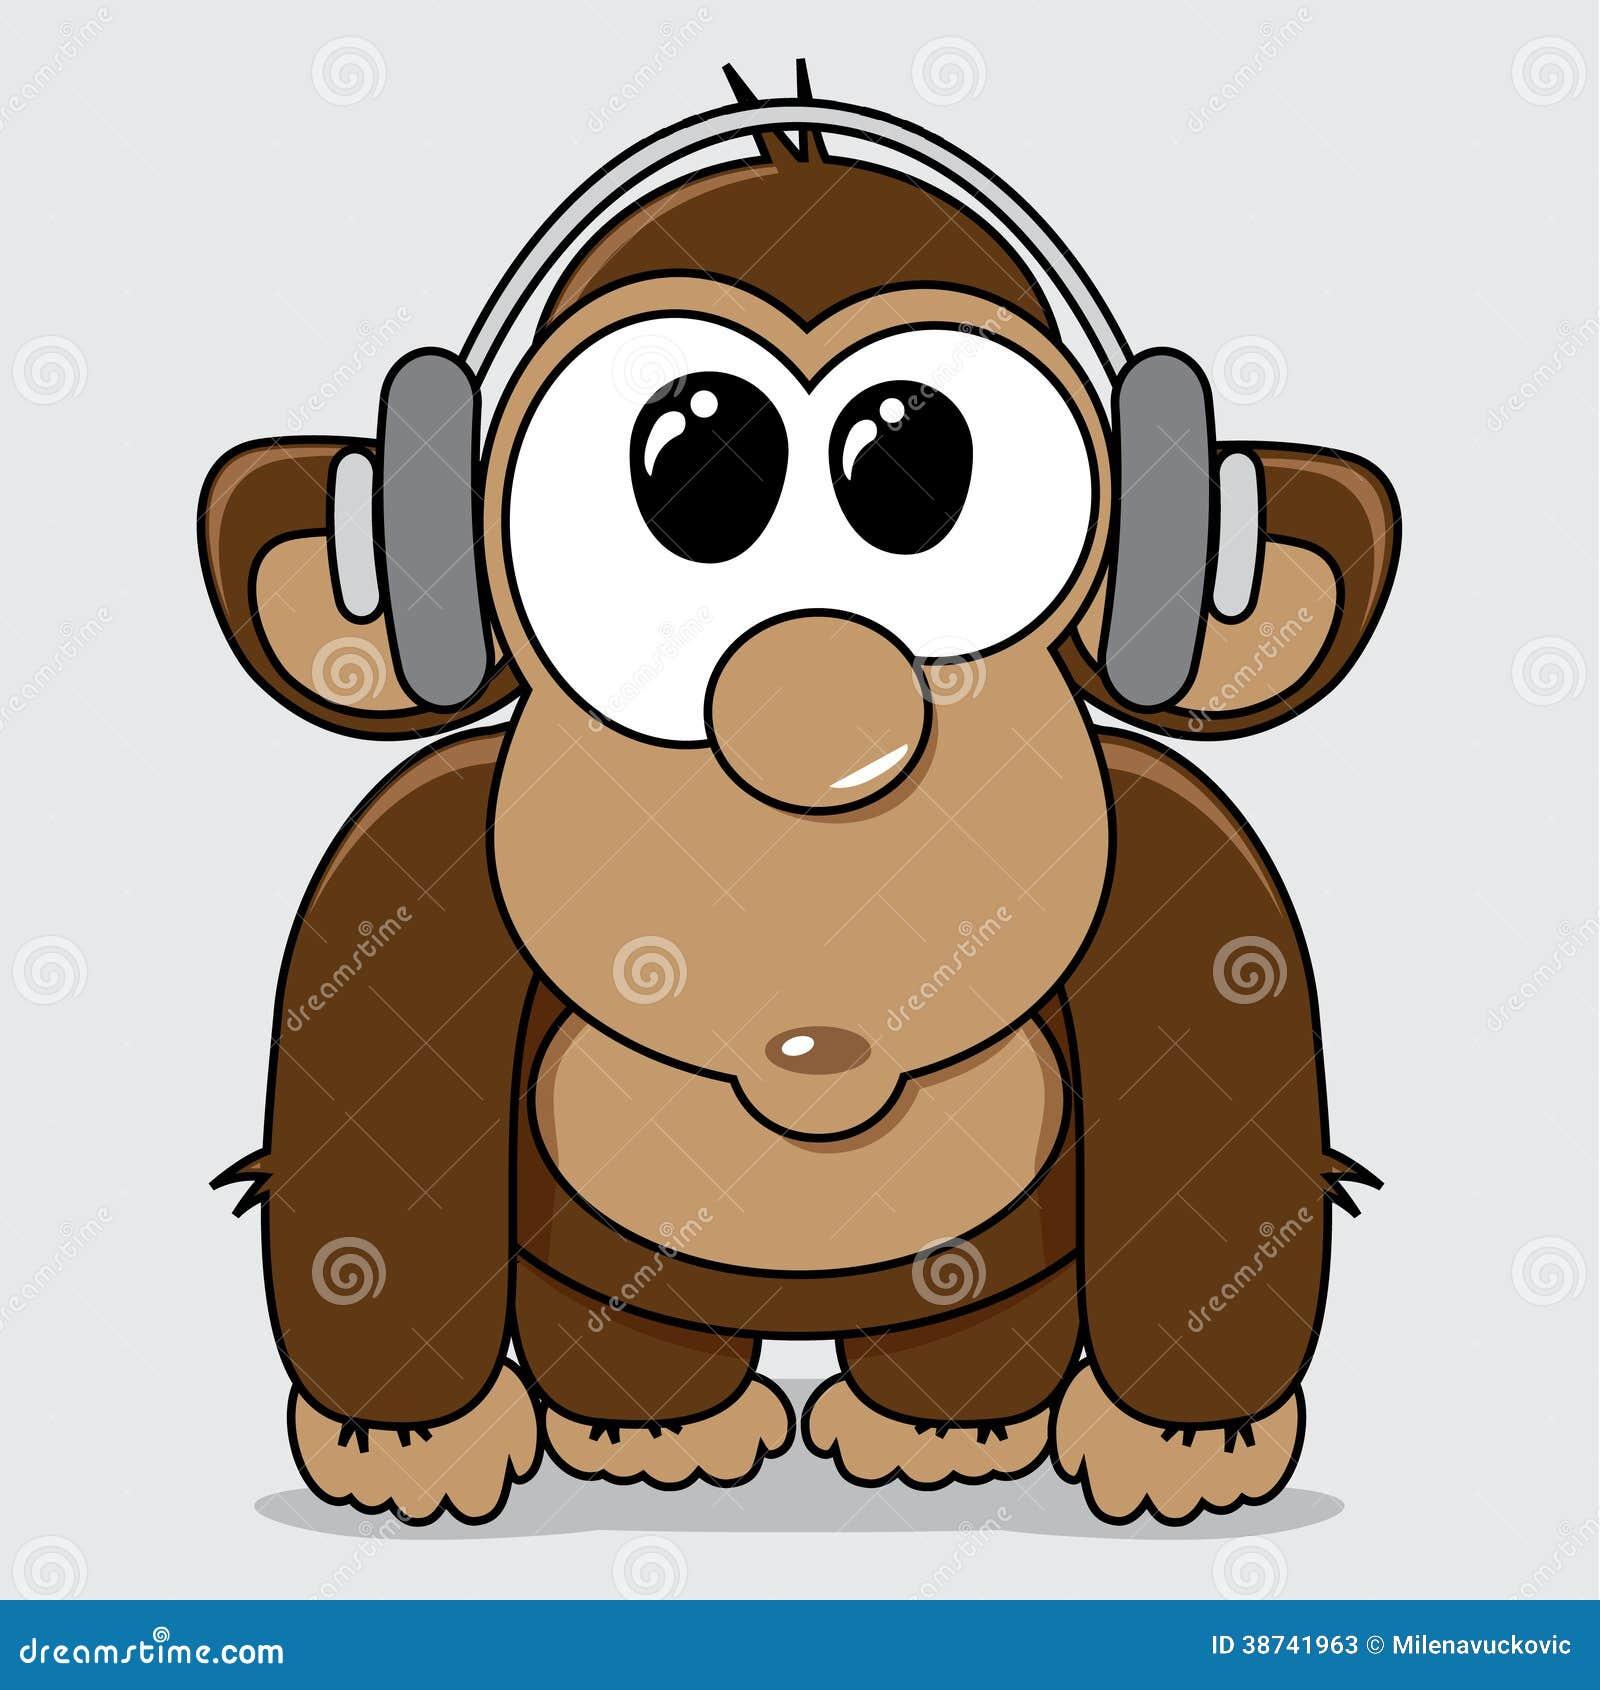 Funny Cartoon Monkey With Headphones Stock Vector